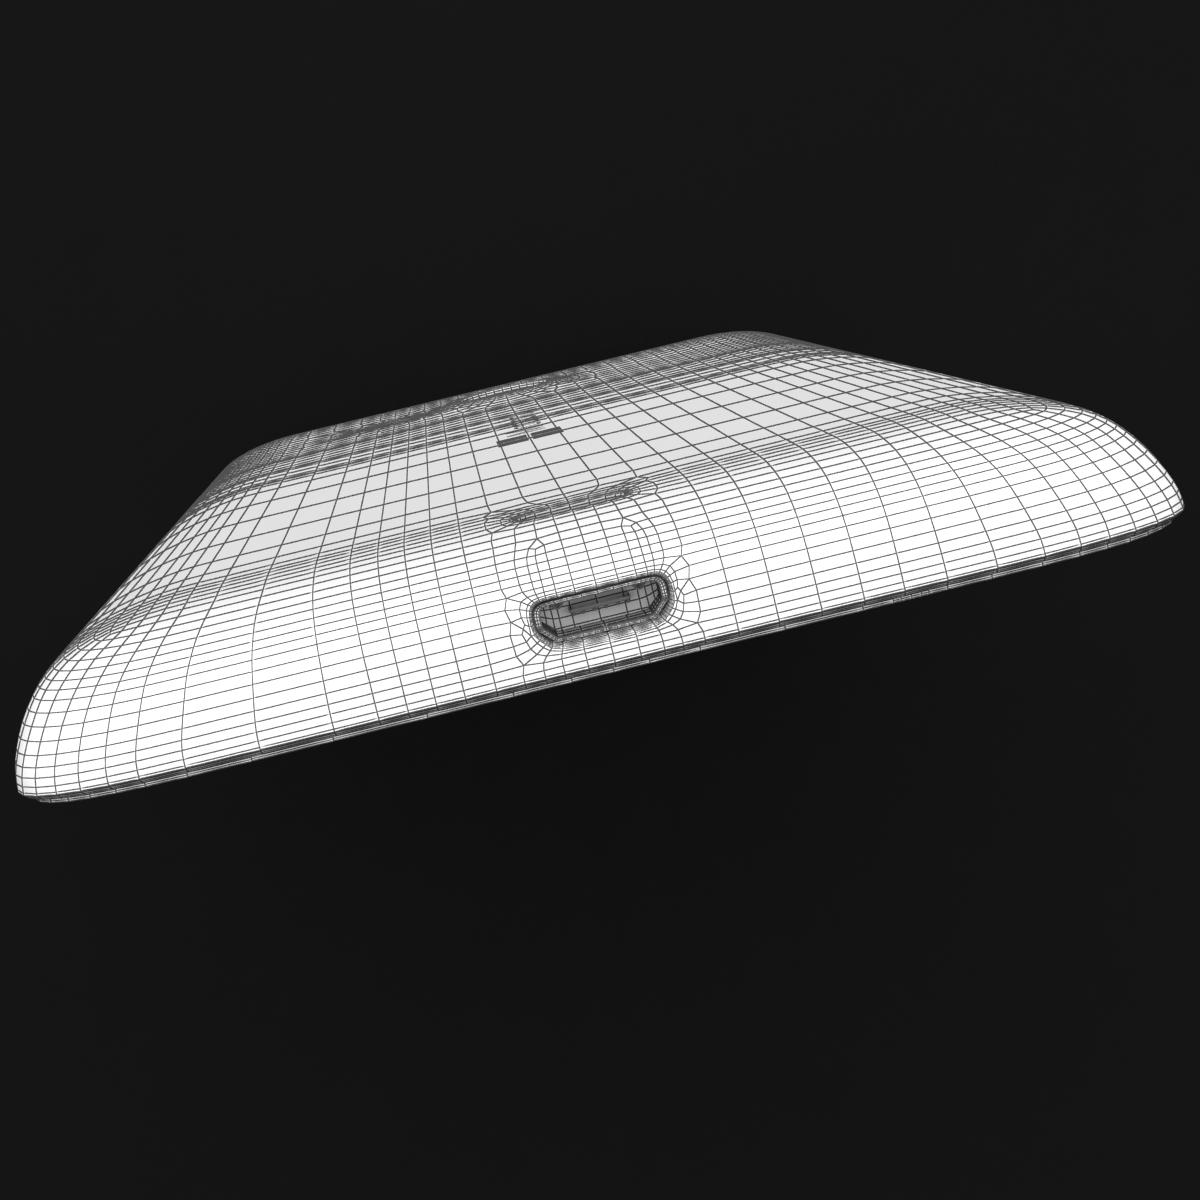 microsoft lumia 535 and dual sim black 3d model 3ds max fbx c4d obj 204372